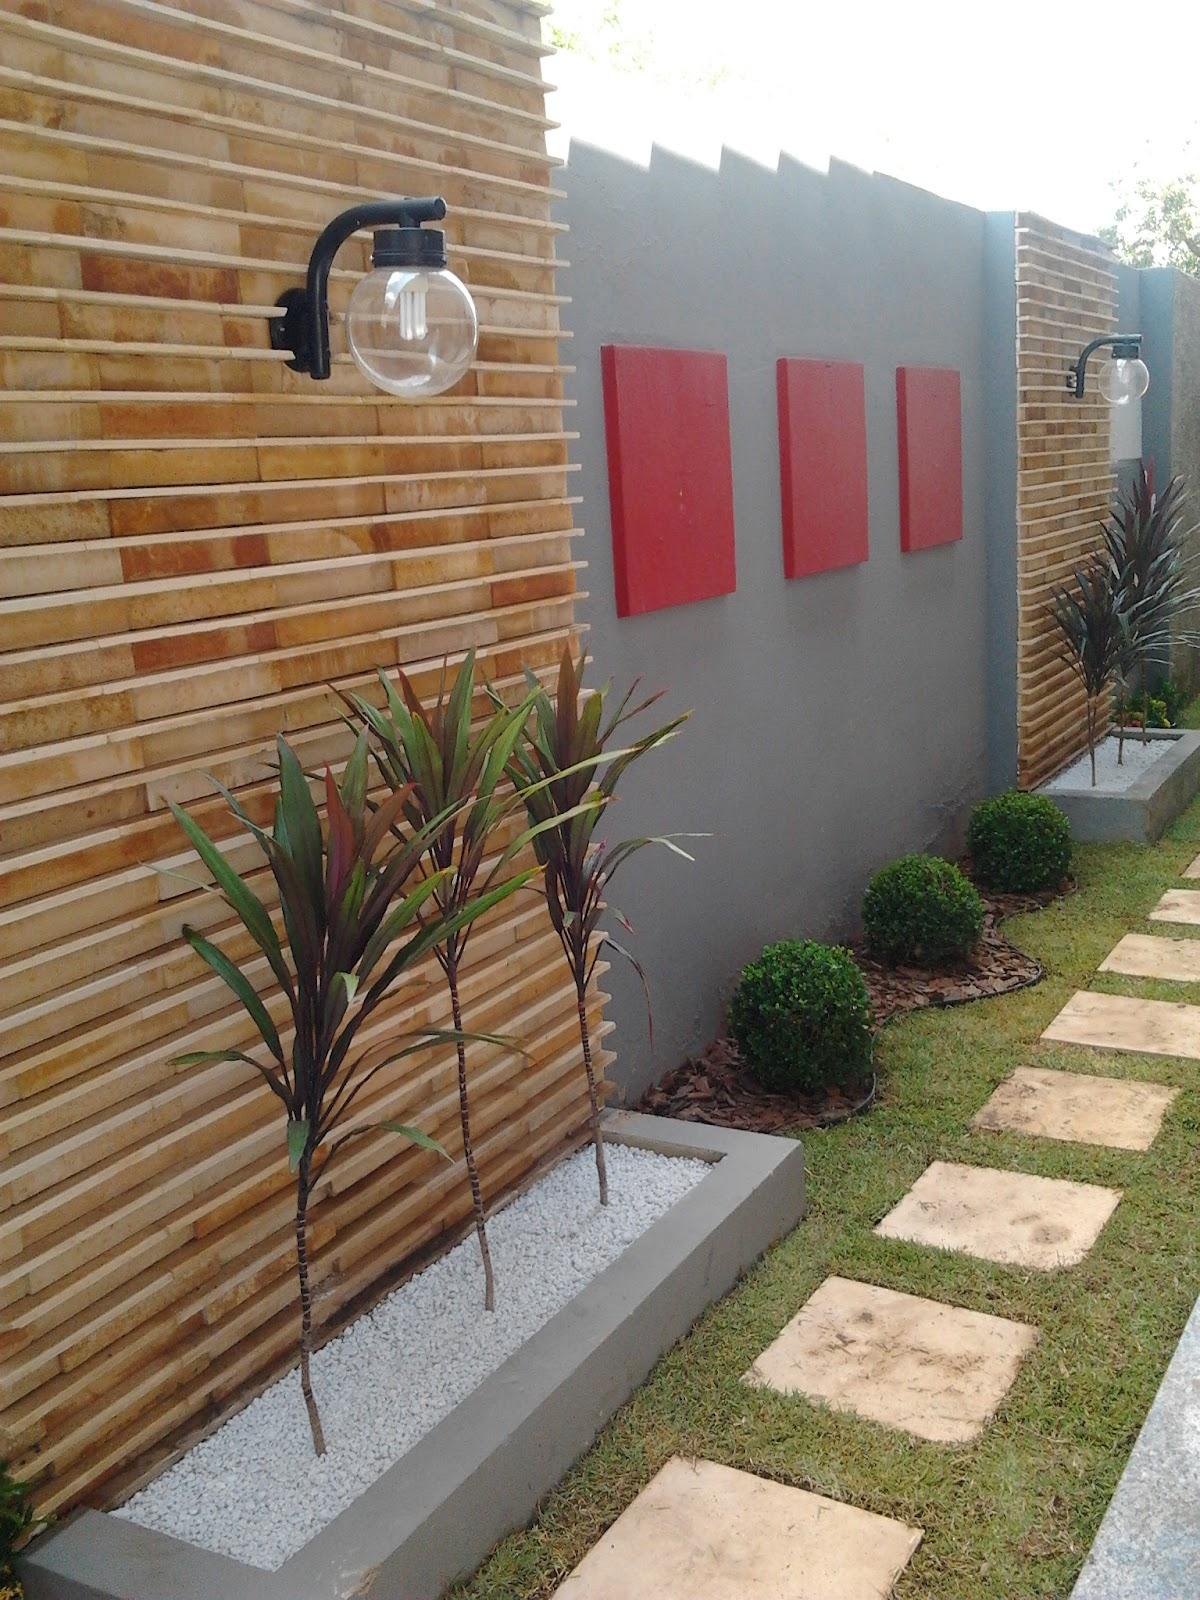 Real paisagismo jardim resid ncial sr tarc zio for Jardines exteriores pequenos para casas